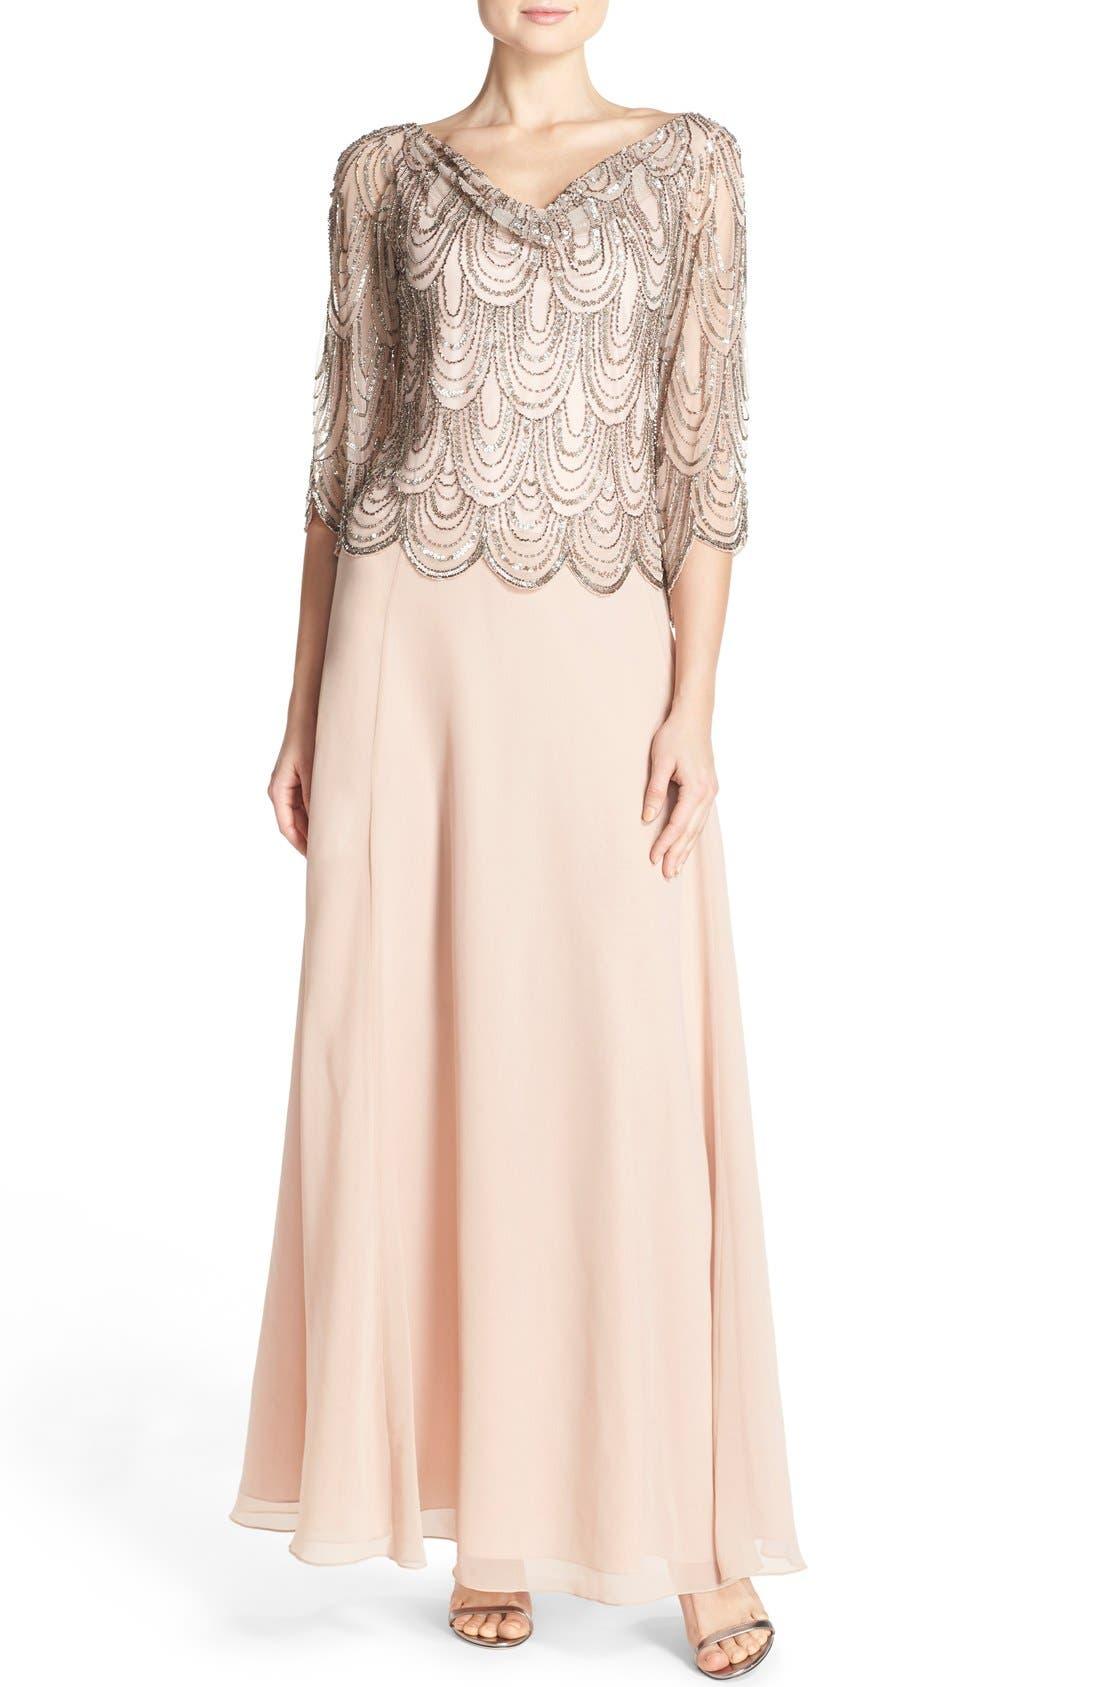 Main Image - J Kara Scallop Embellished Popover Gown